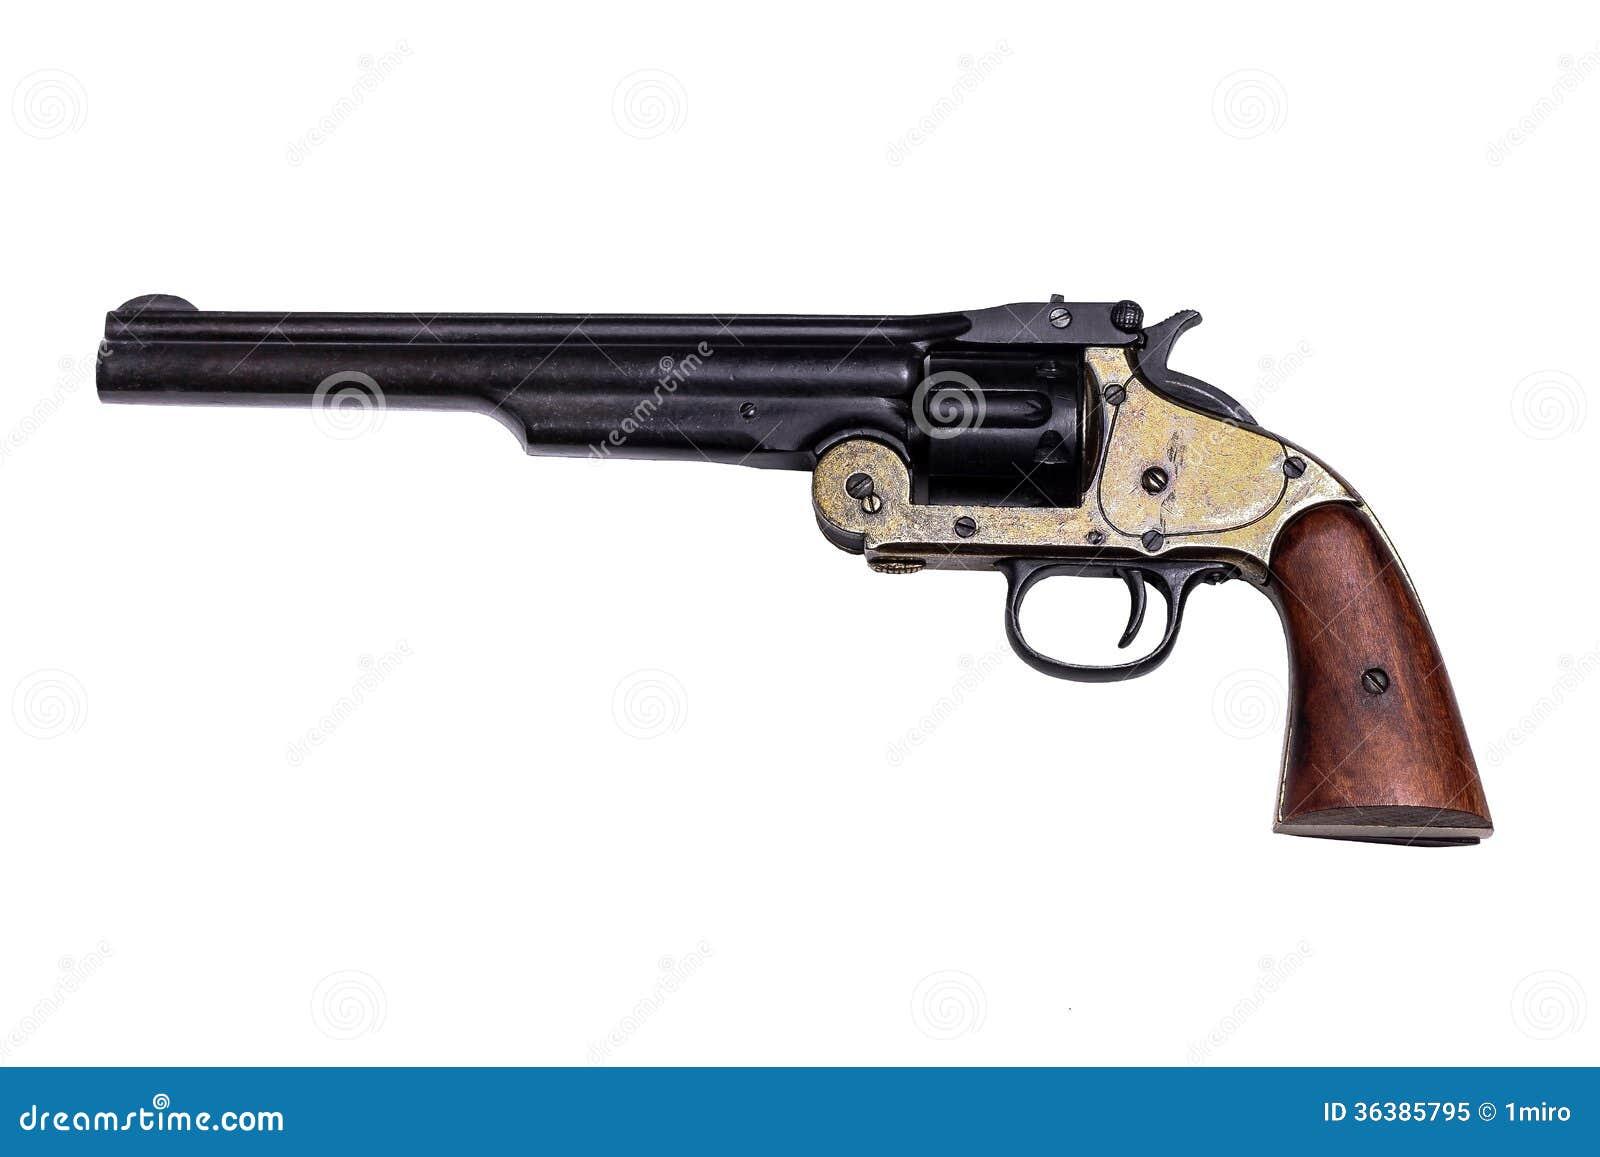 gun white background - photo #17